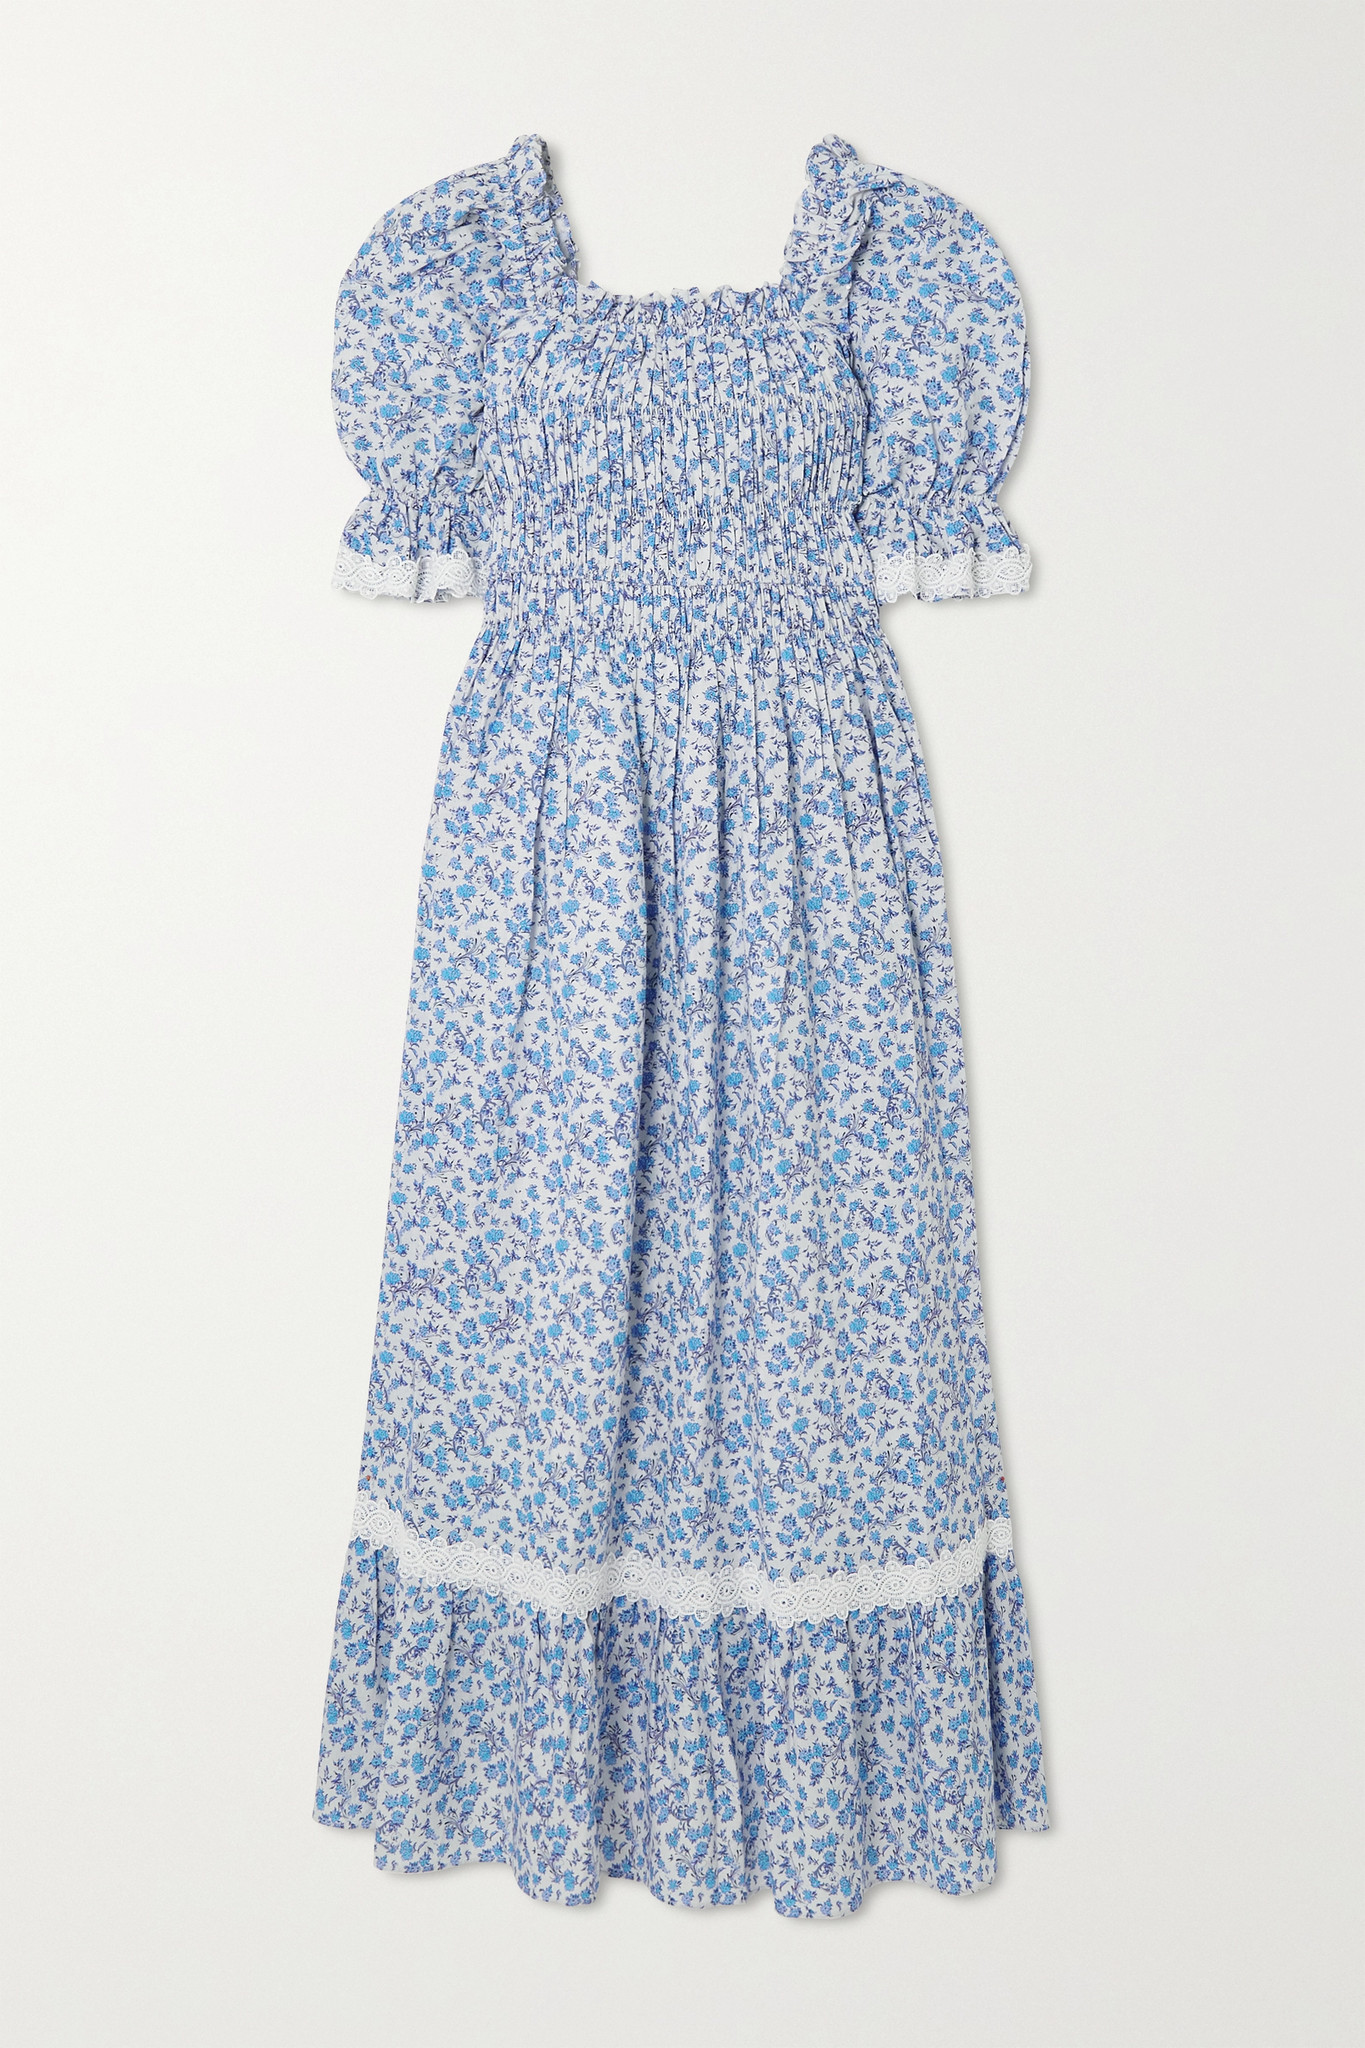 LUG VON SIGA - Elisa Smocked Ruffled Printed Cotton And Linen-blend Midi Dress - Blue - FR34